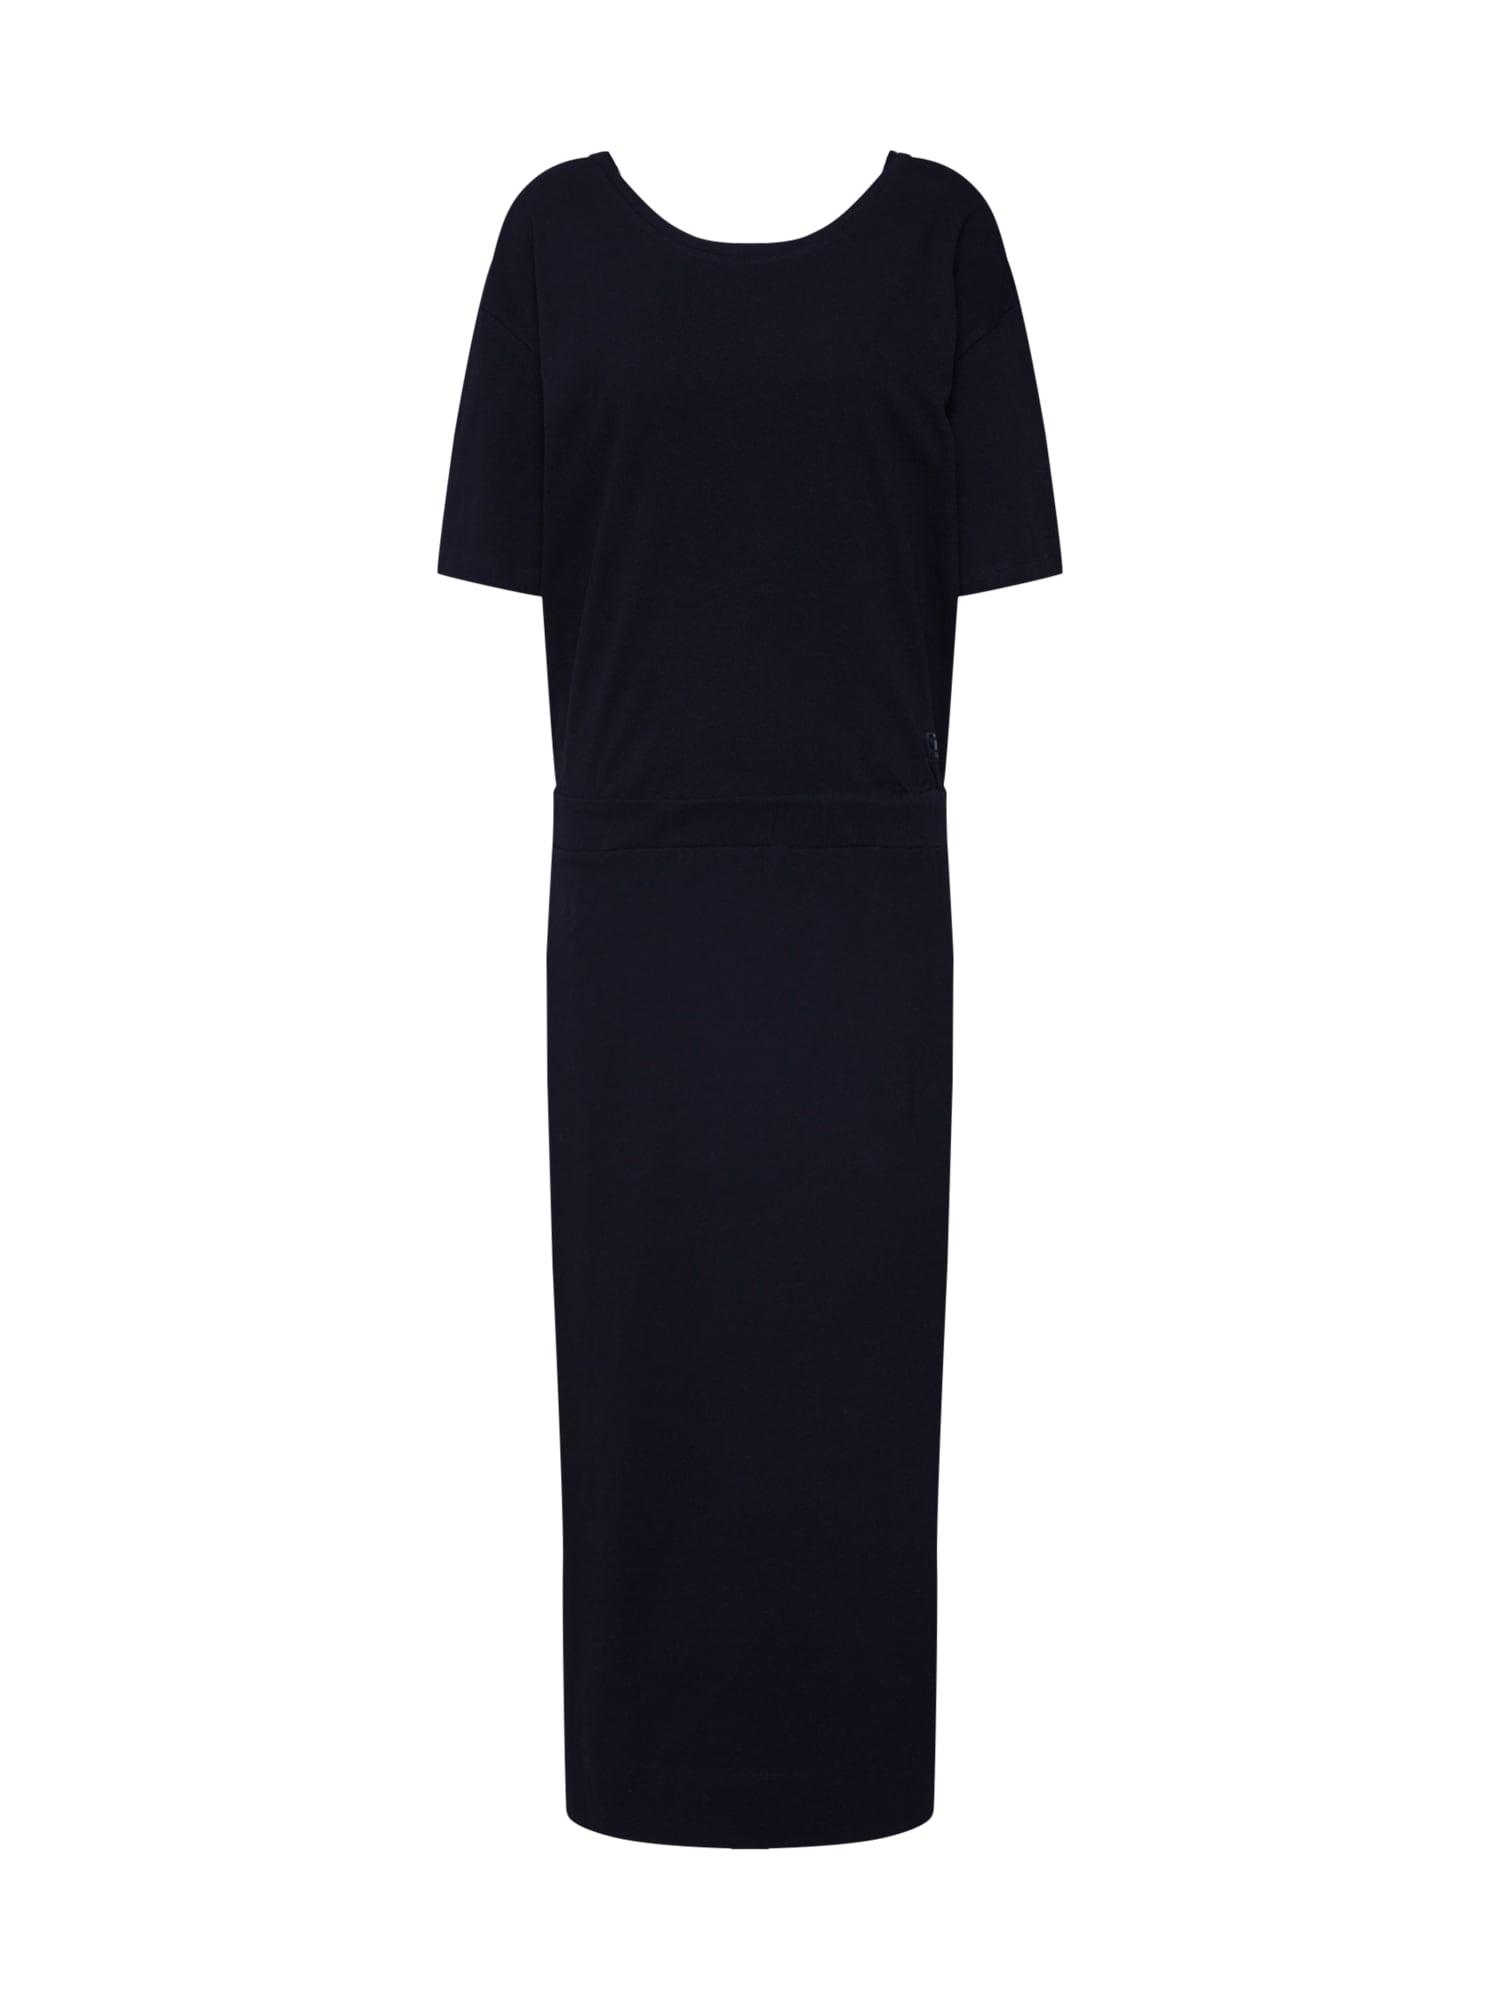 Společenské šaty Bohdana černá G-STAR RAW